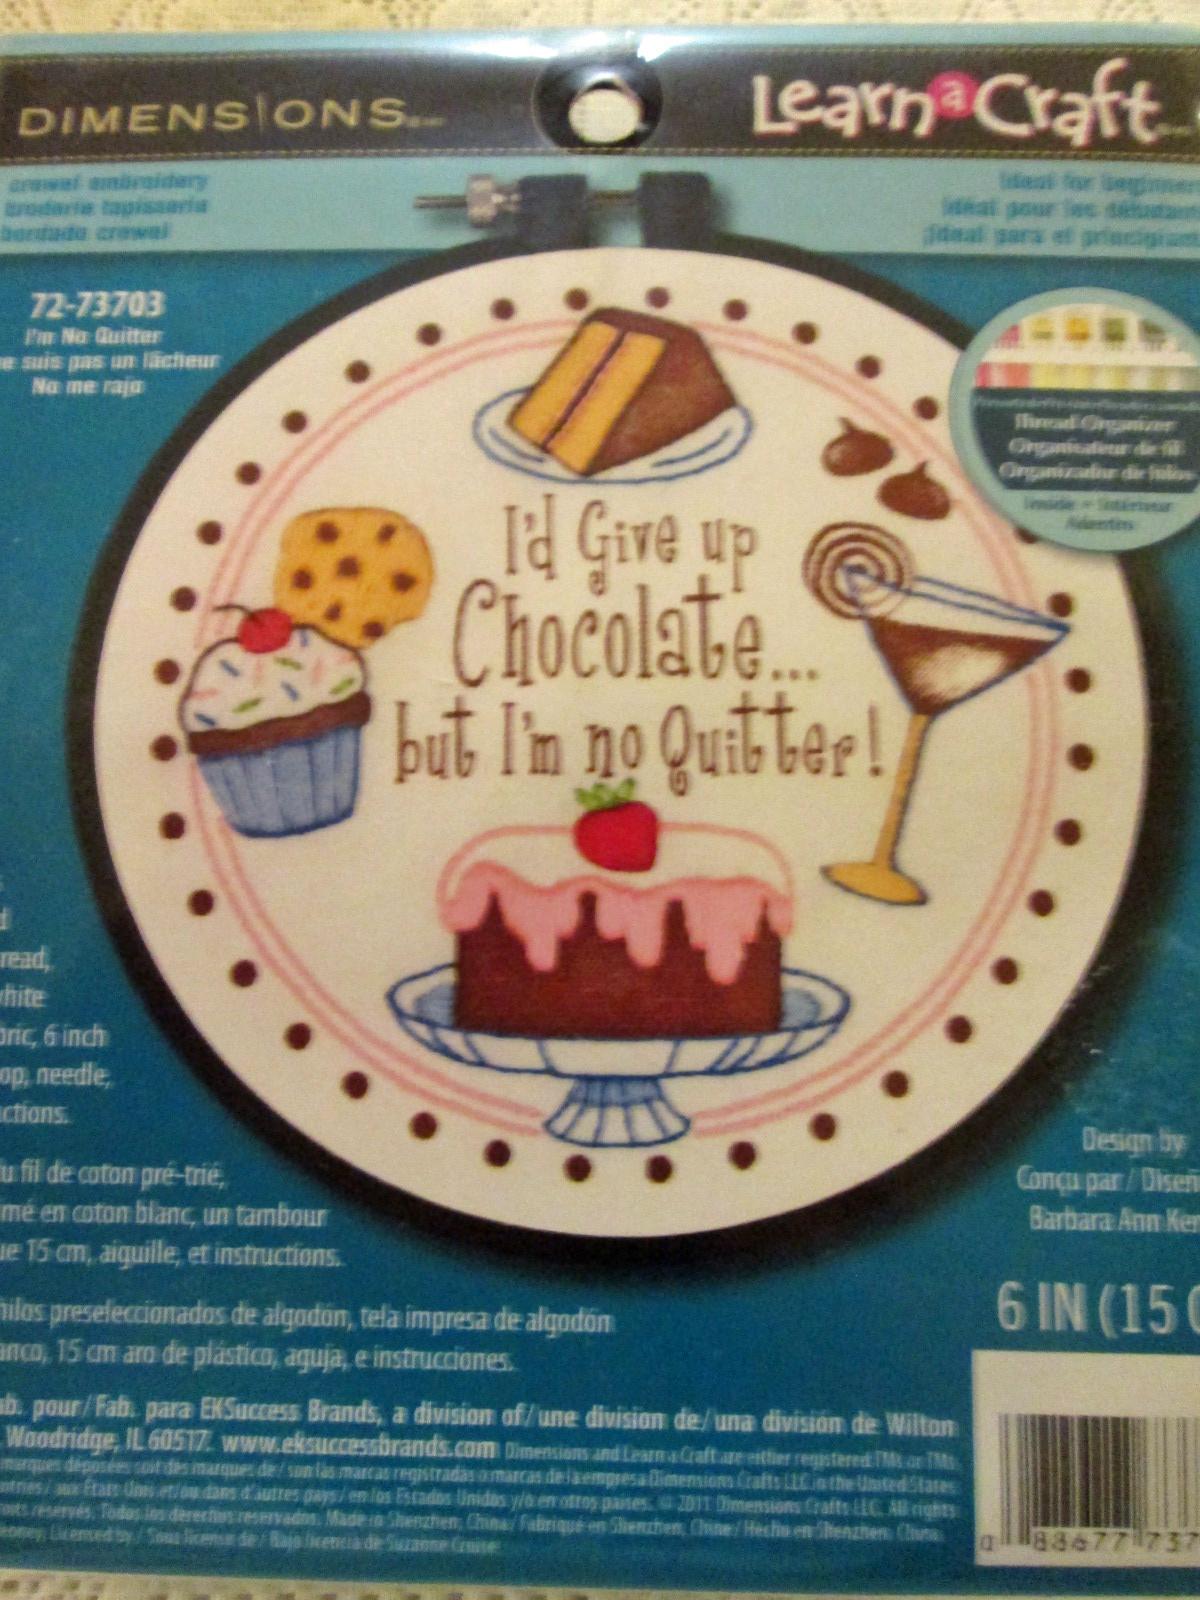 I'm No Quitter Chocolate Cross Stitch Kit